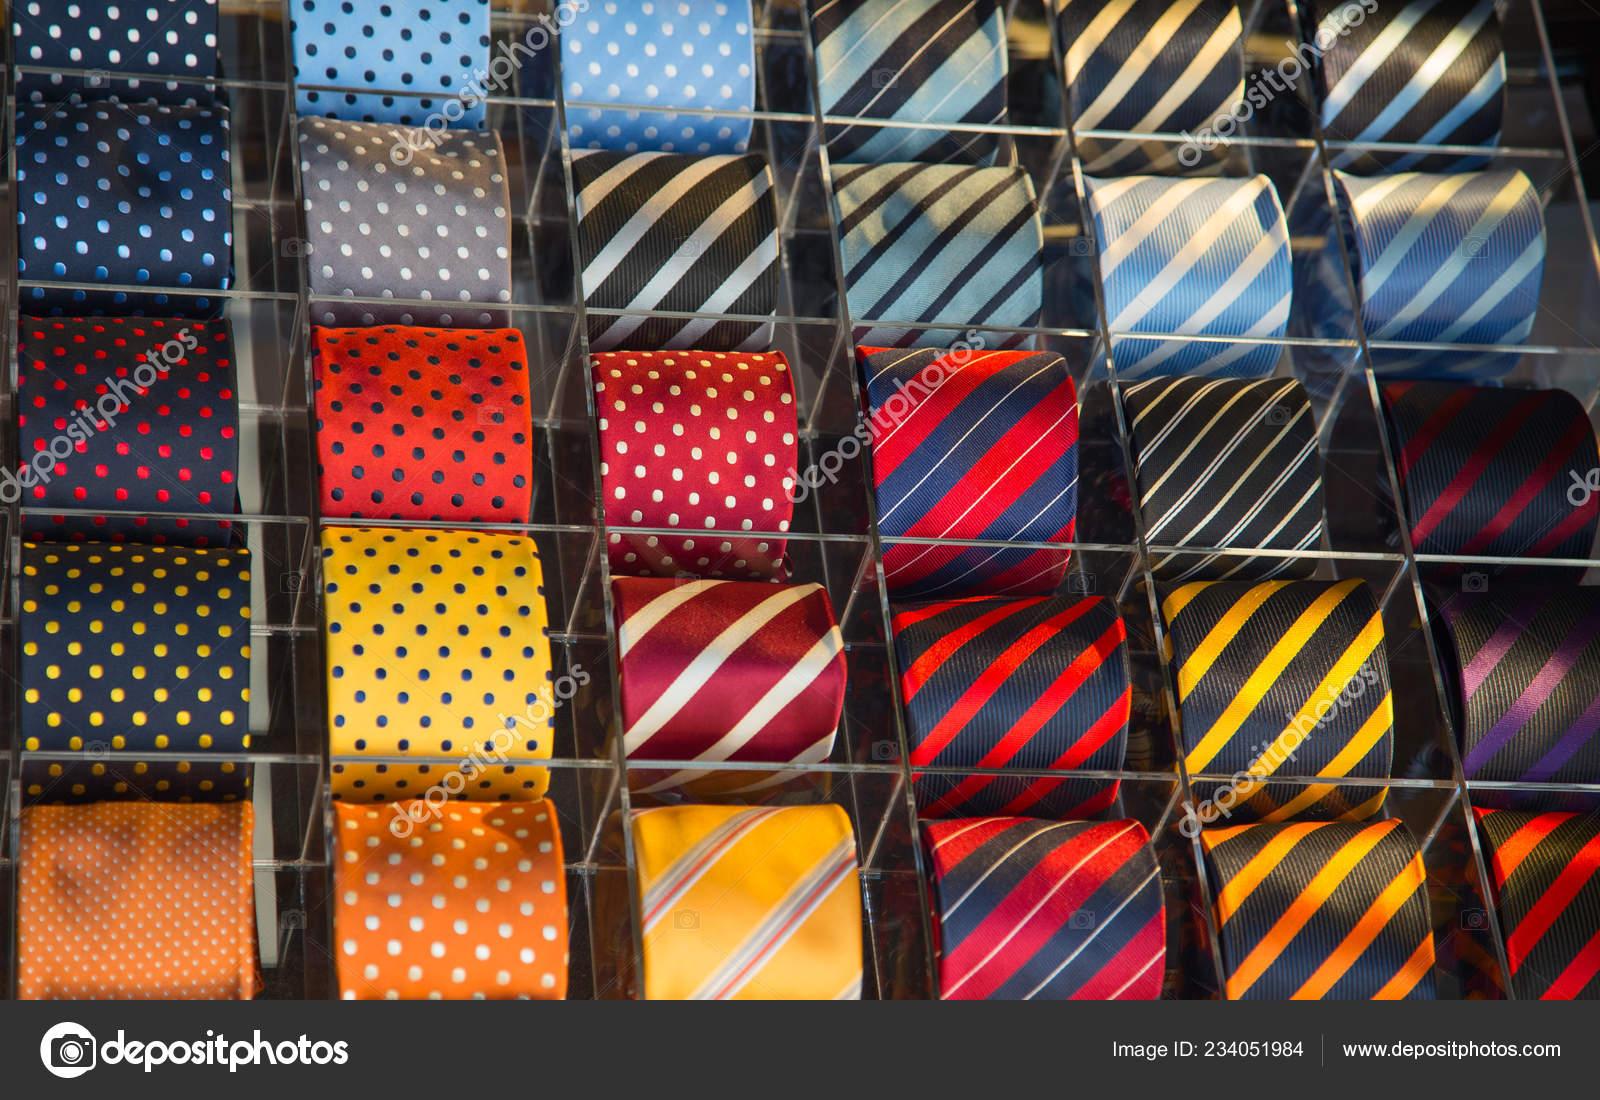 3c59911f89db Colorful Tie Collection Men Shop — Stock Photo © swisshippo #234051984